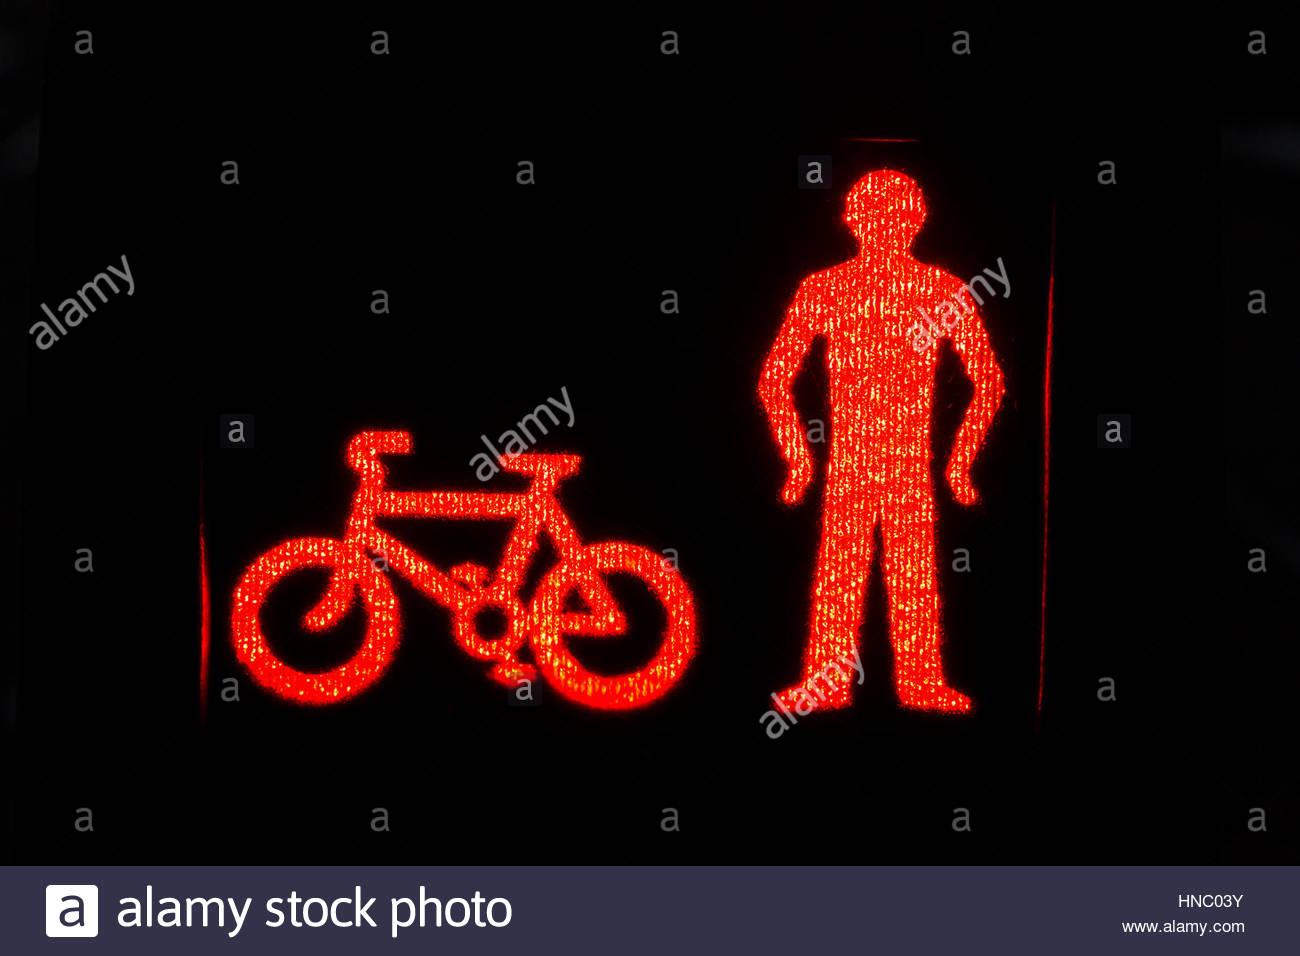 Illustrated pedestrian signal at crosswalk, Glasgow. - Stock Image